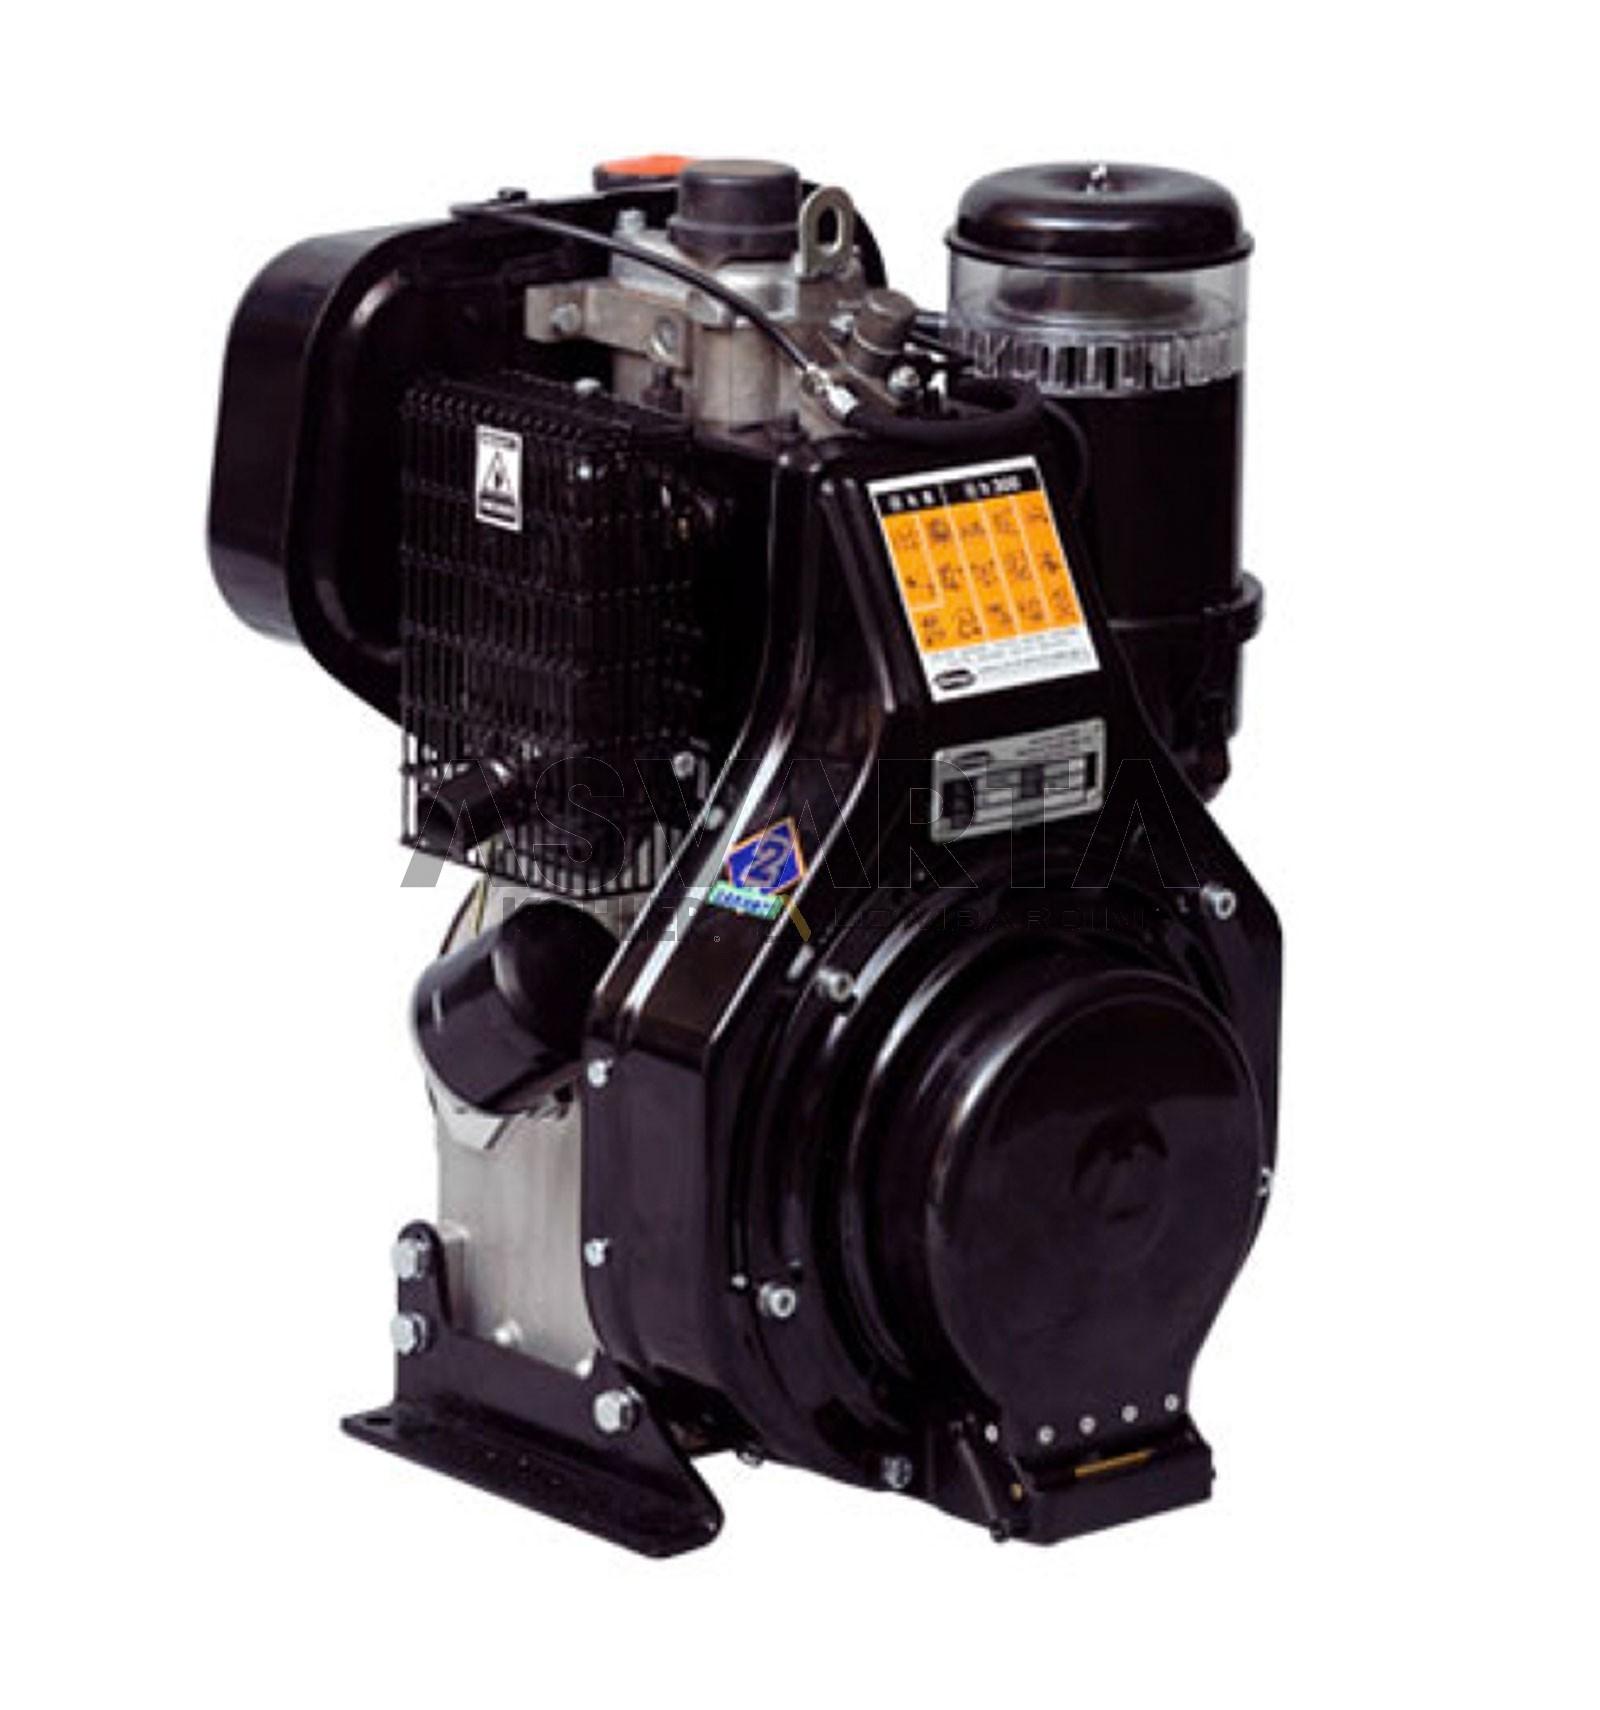 lombardini engine 3ld 510 electric starter